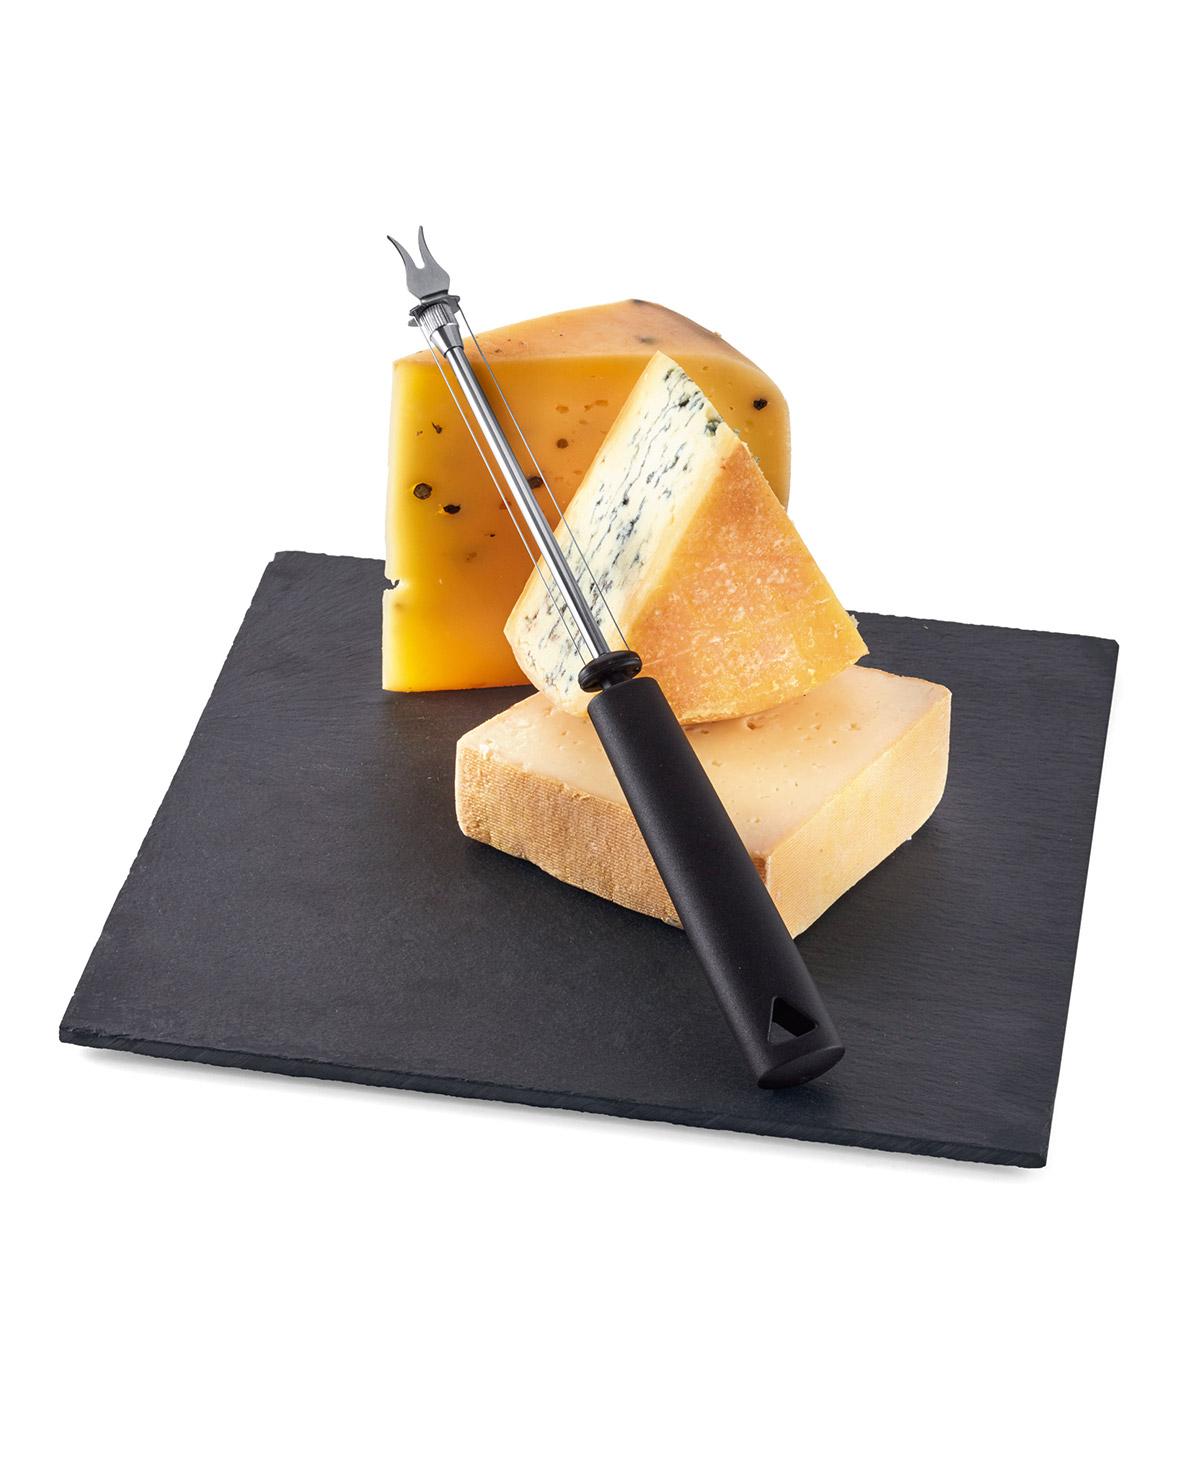 Käseschneider mit Draht Drahtkäseschenider triangle Made in Germany Solingen Kunststoff Spirit